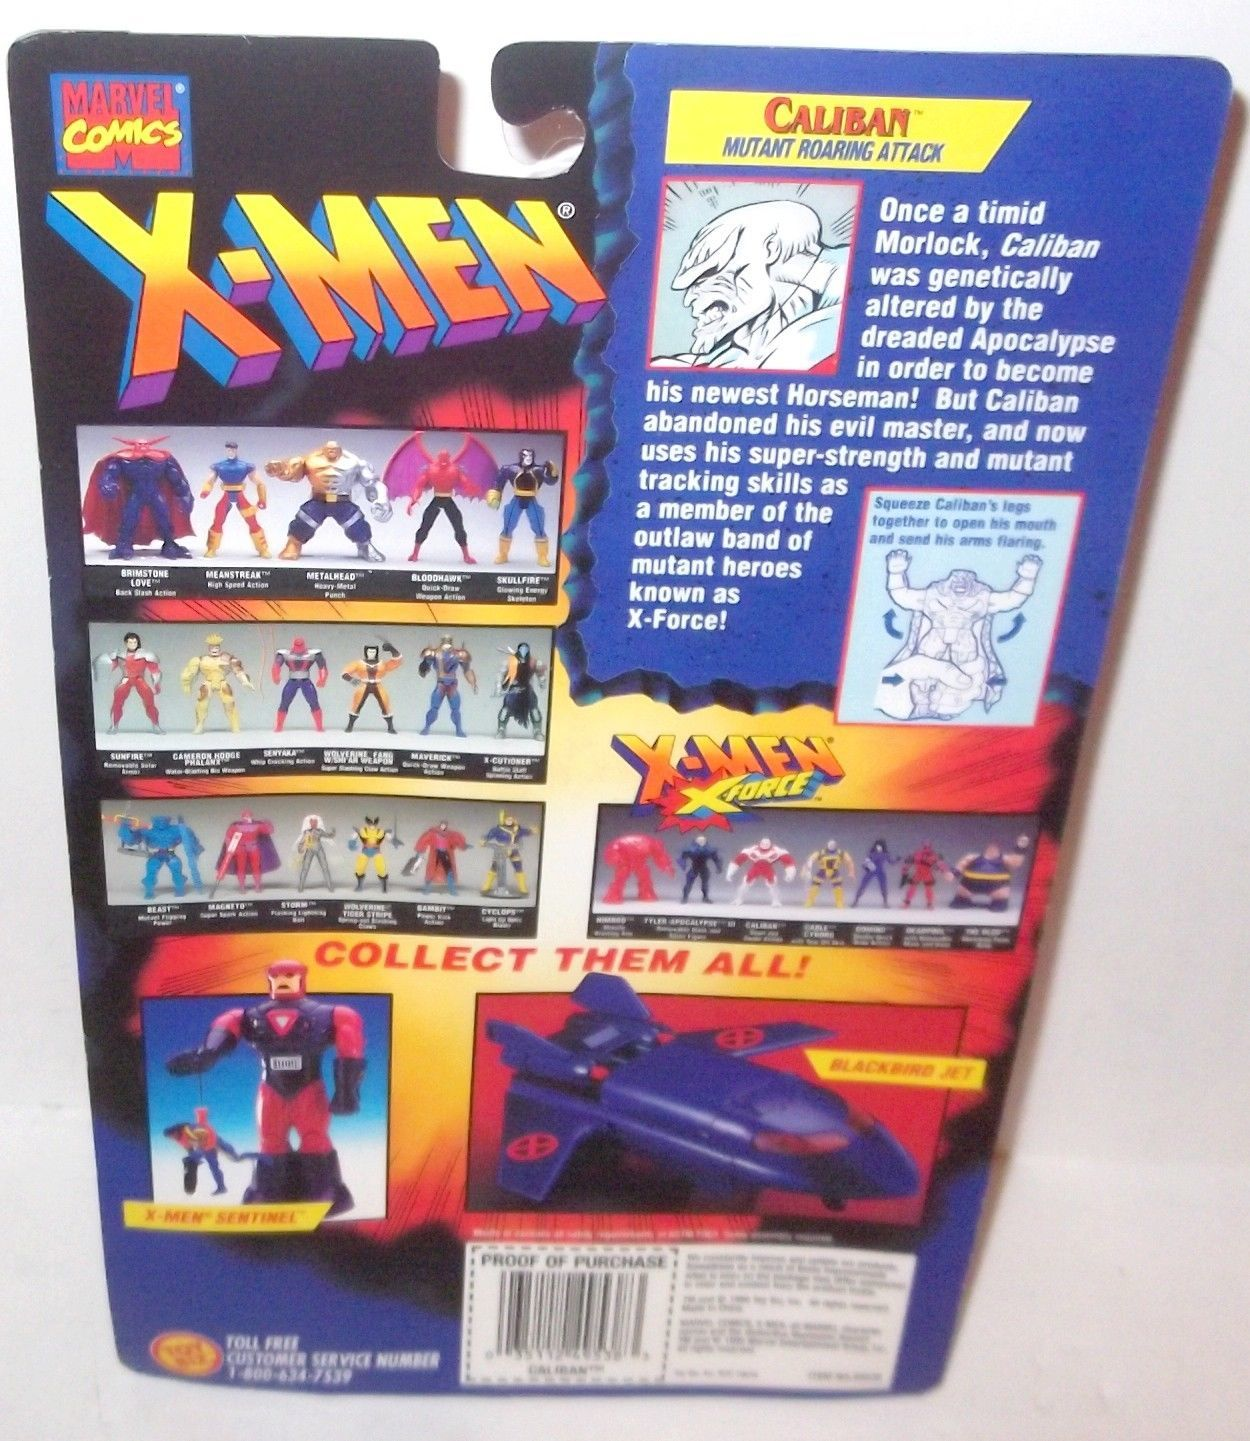 CALIBAN 1995 Action Figure X-men X-Force X-Factor 10.0 Toy Biz MOC or LOOSE